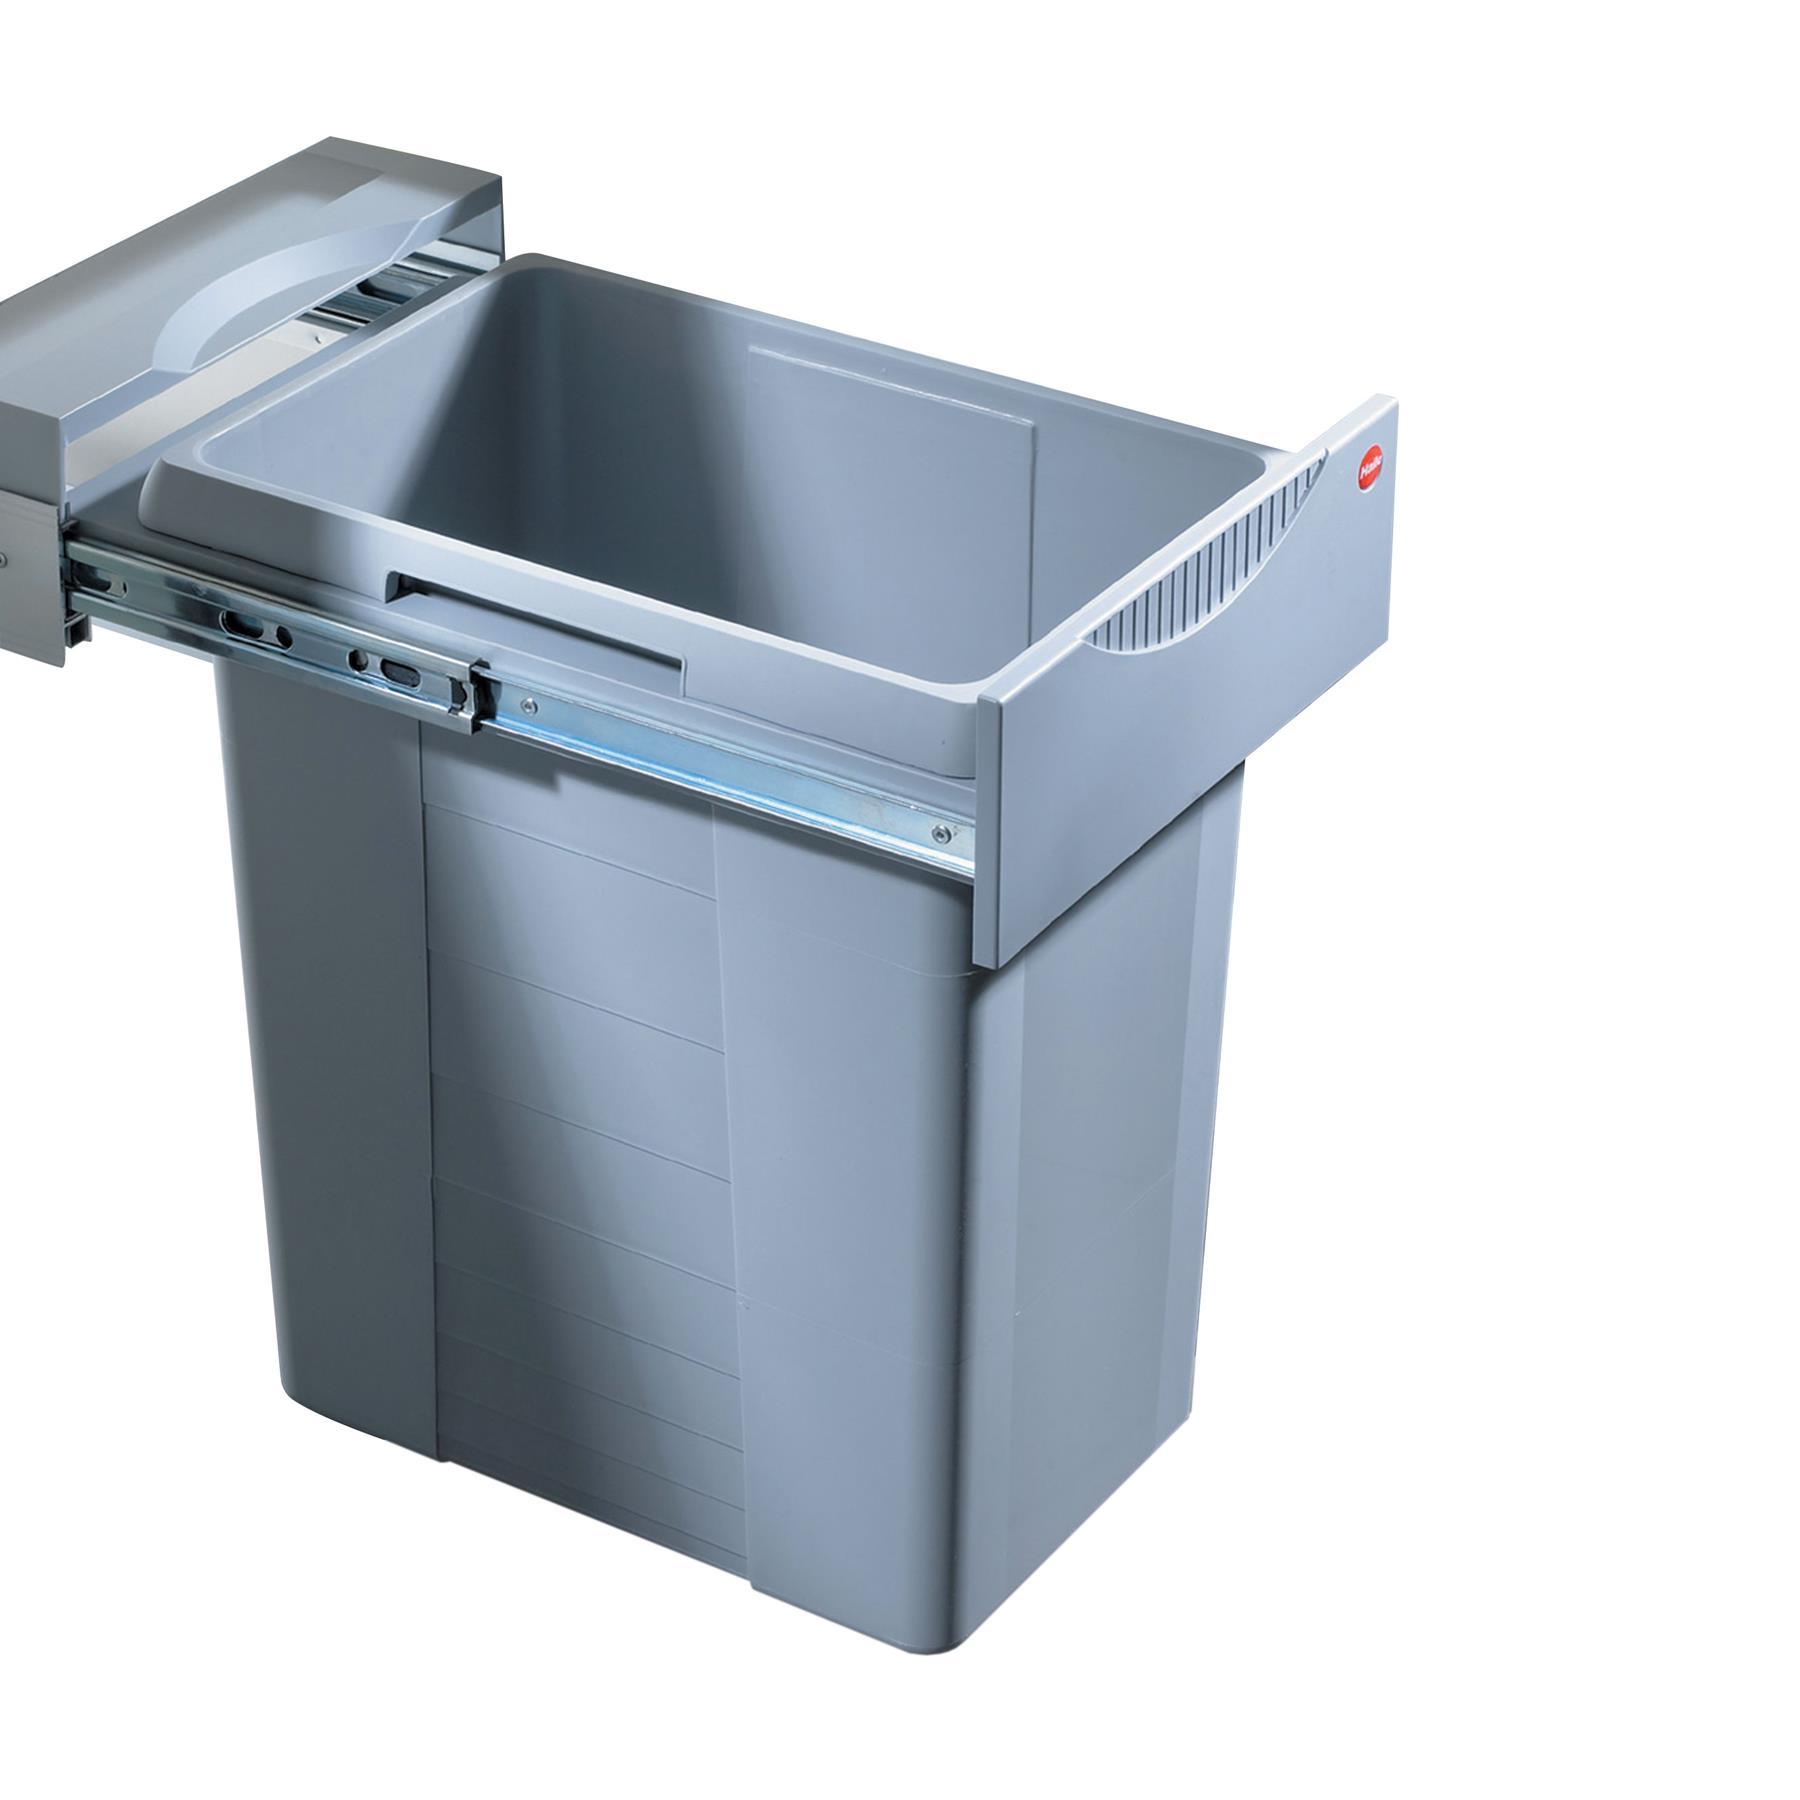 Hailo Easy Cargo Inbouwafvalemmer 40 Liter Kopen Shop Bij Fonq